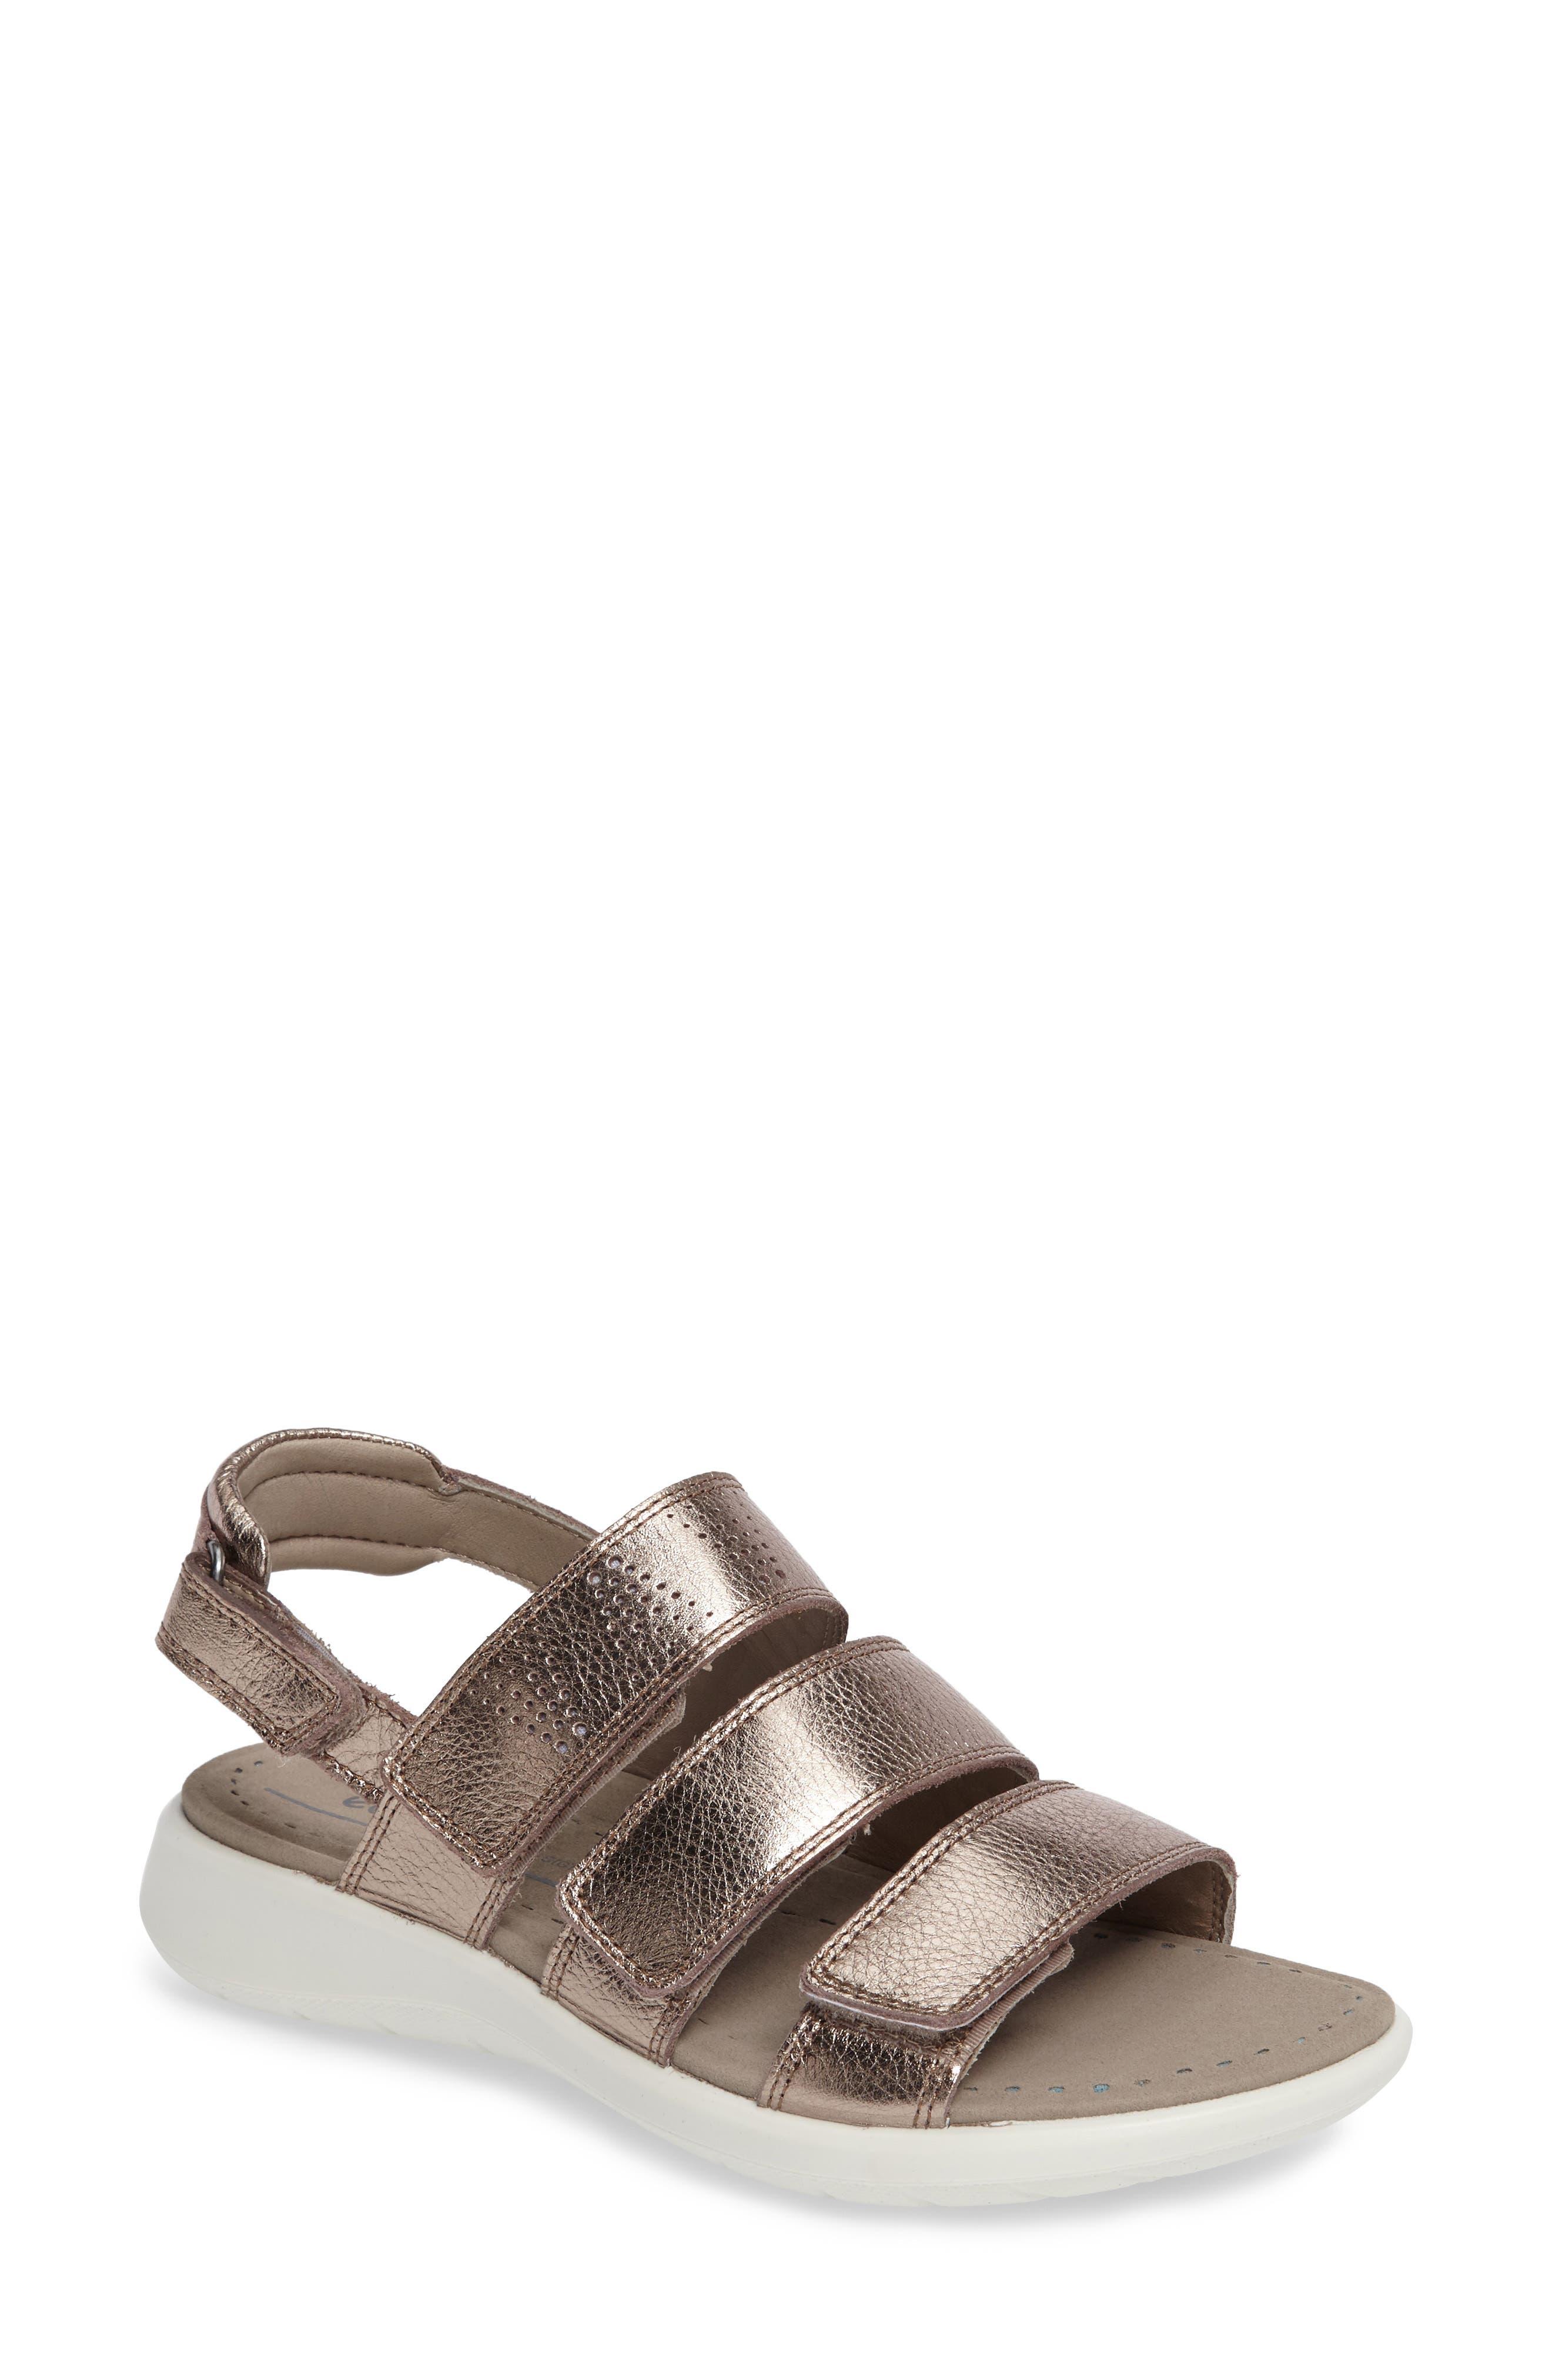 Alternate Image 1 Selected - ECCO Soft 5 Sandal (Women)